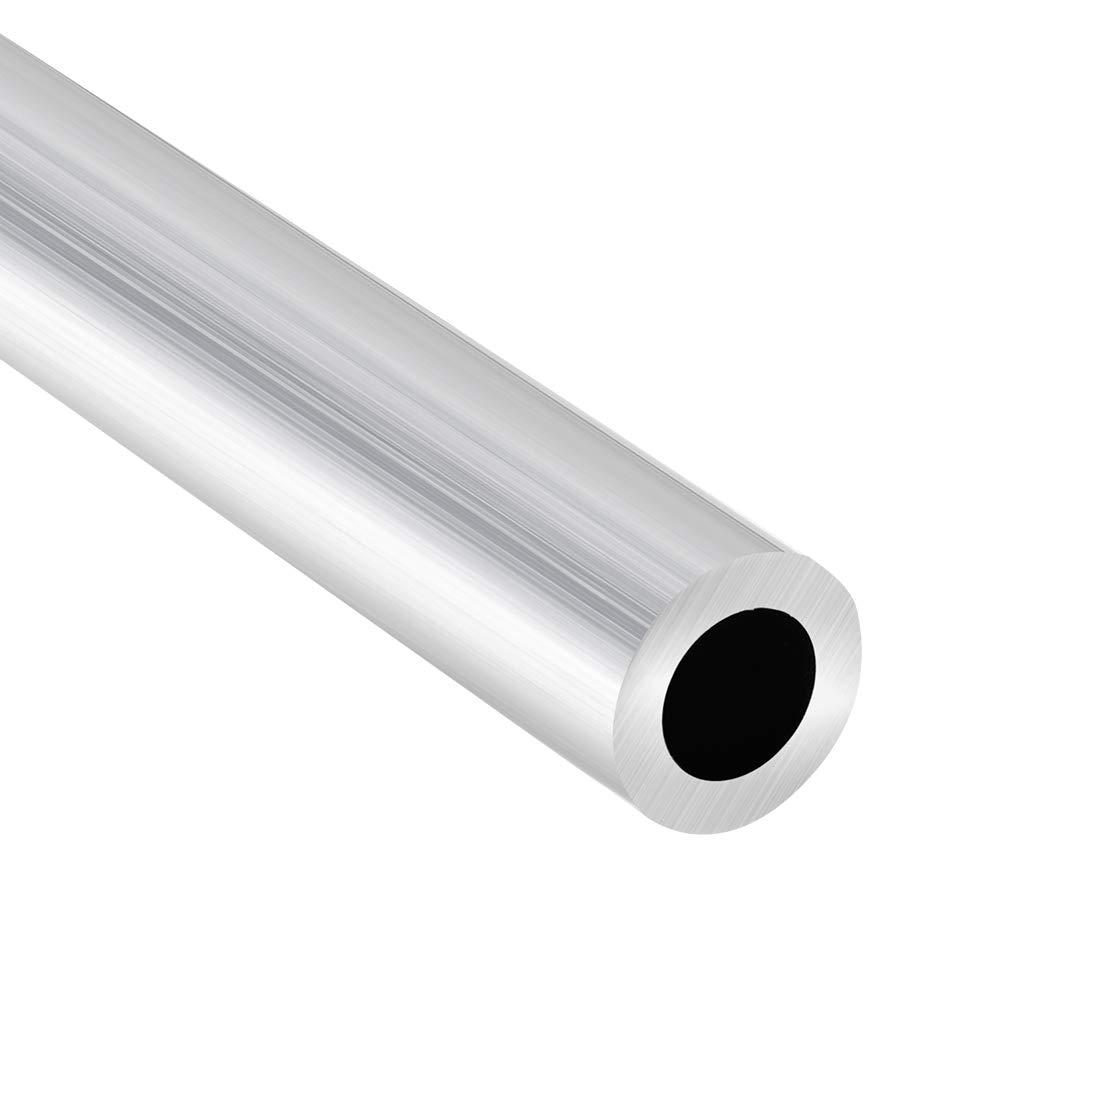 sourcing map 6063 Aluminio Redondo Tubo 300mm Longitud 16mm OD 5-15mm Di/ámetro Interior Sin Costura Aluminio Recto Tuber/ía ID de 10 mm x 16 mm de di/ámetro exterior